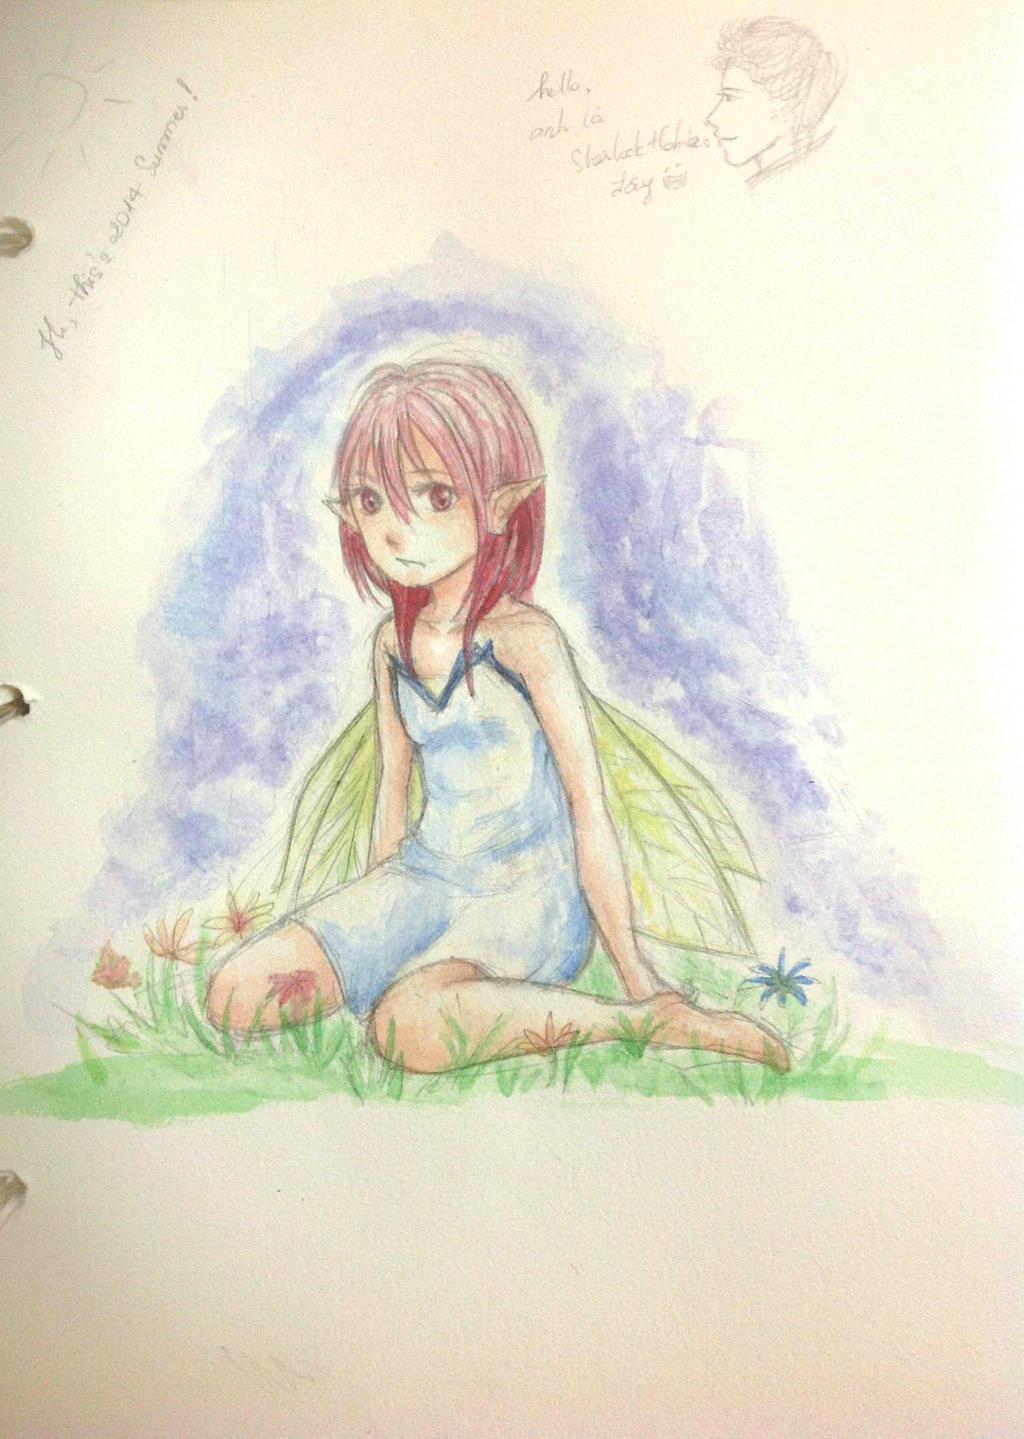 [Random Art] Red Hair Fairy by HiiragiAzayaka